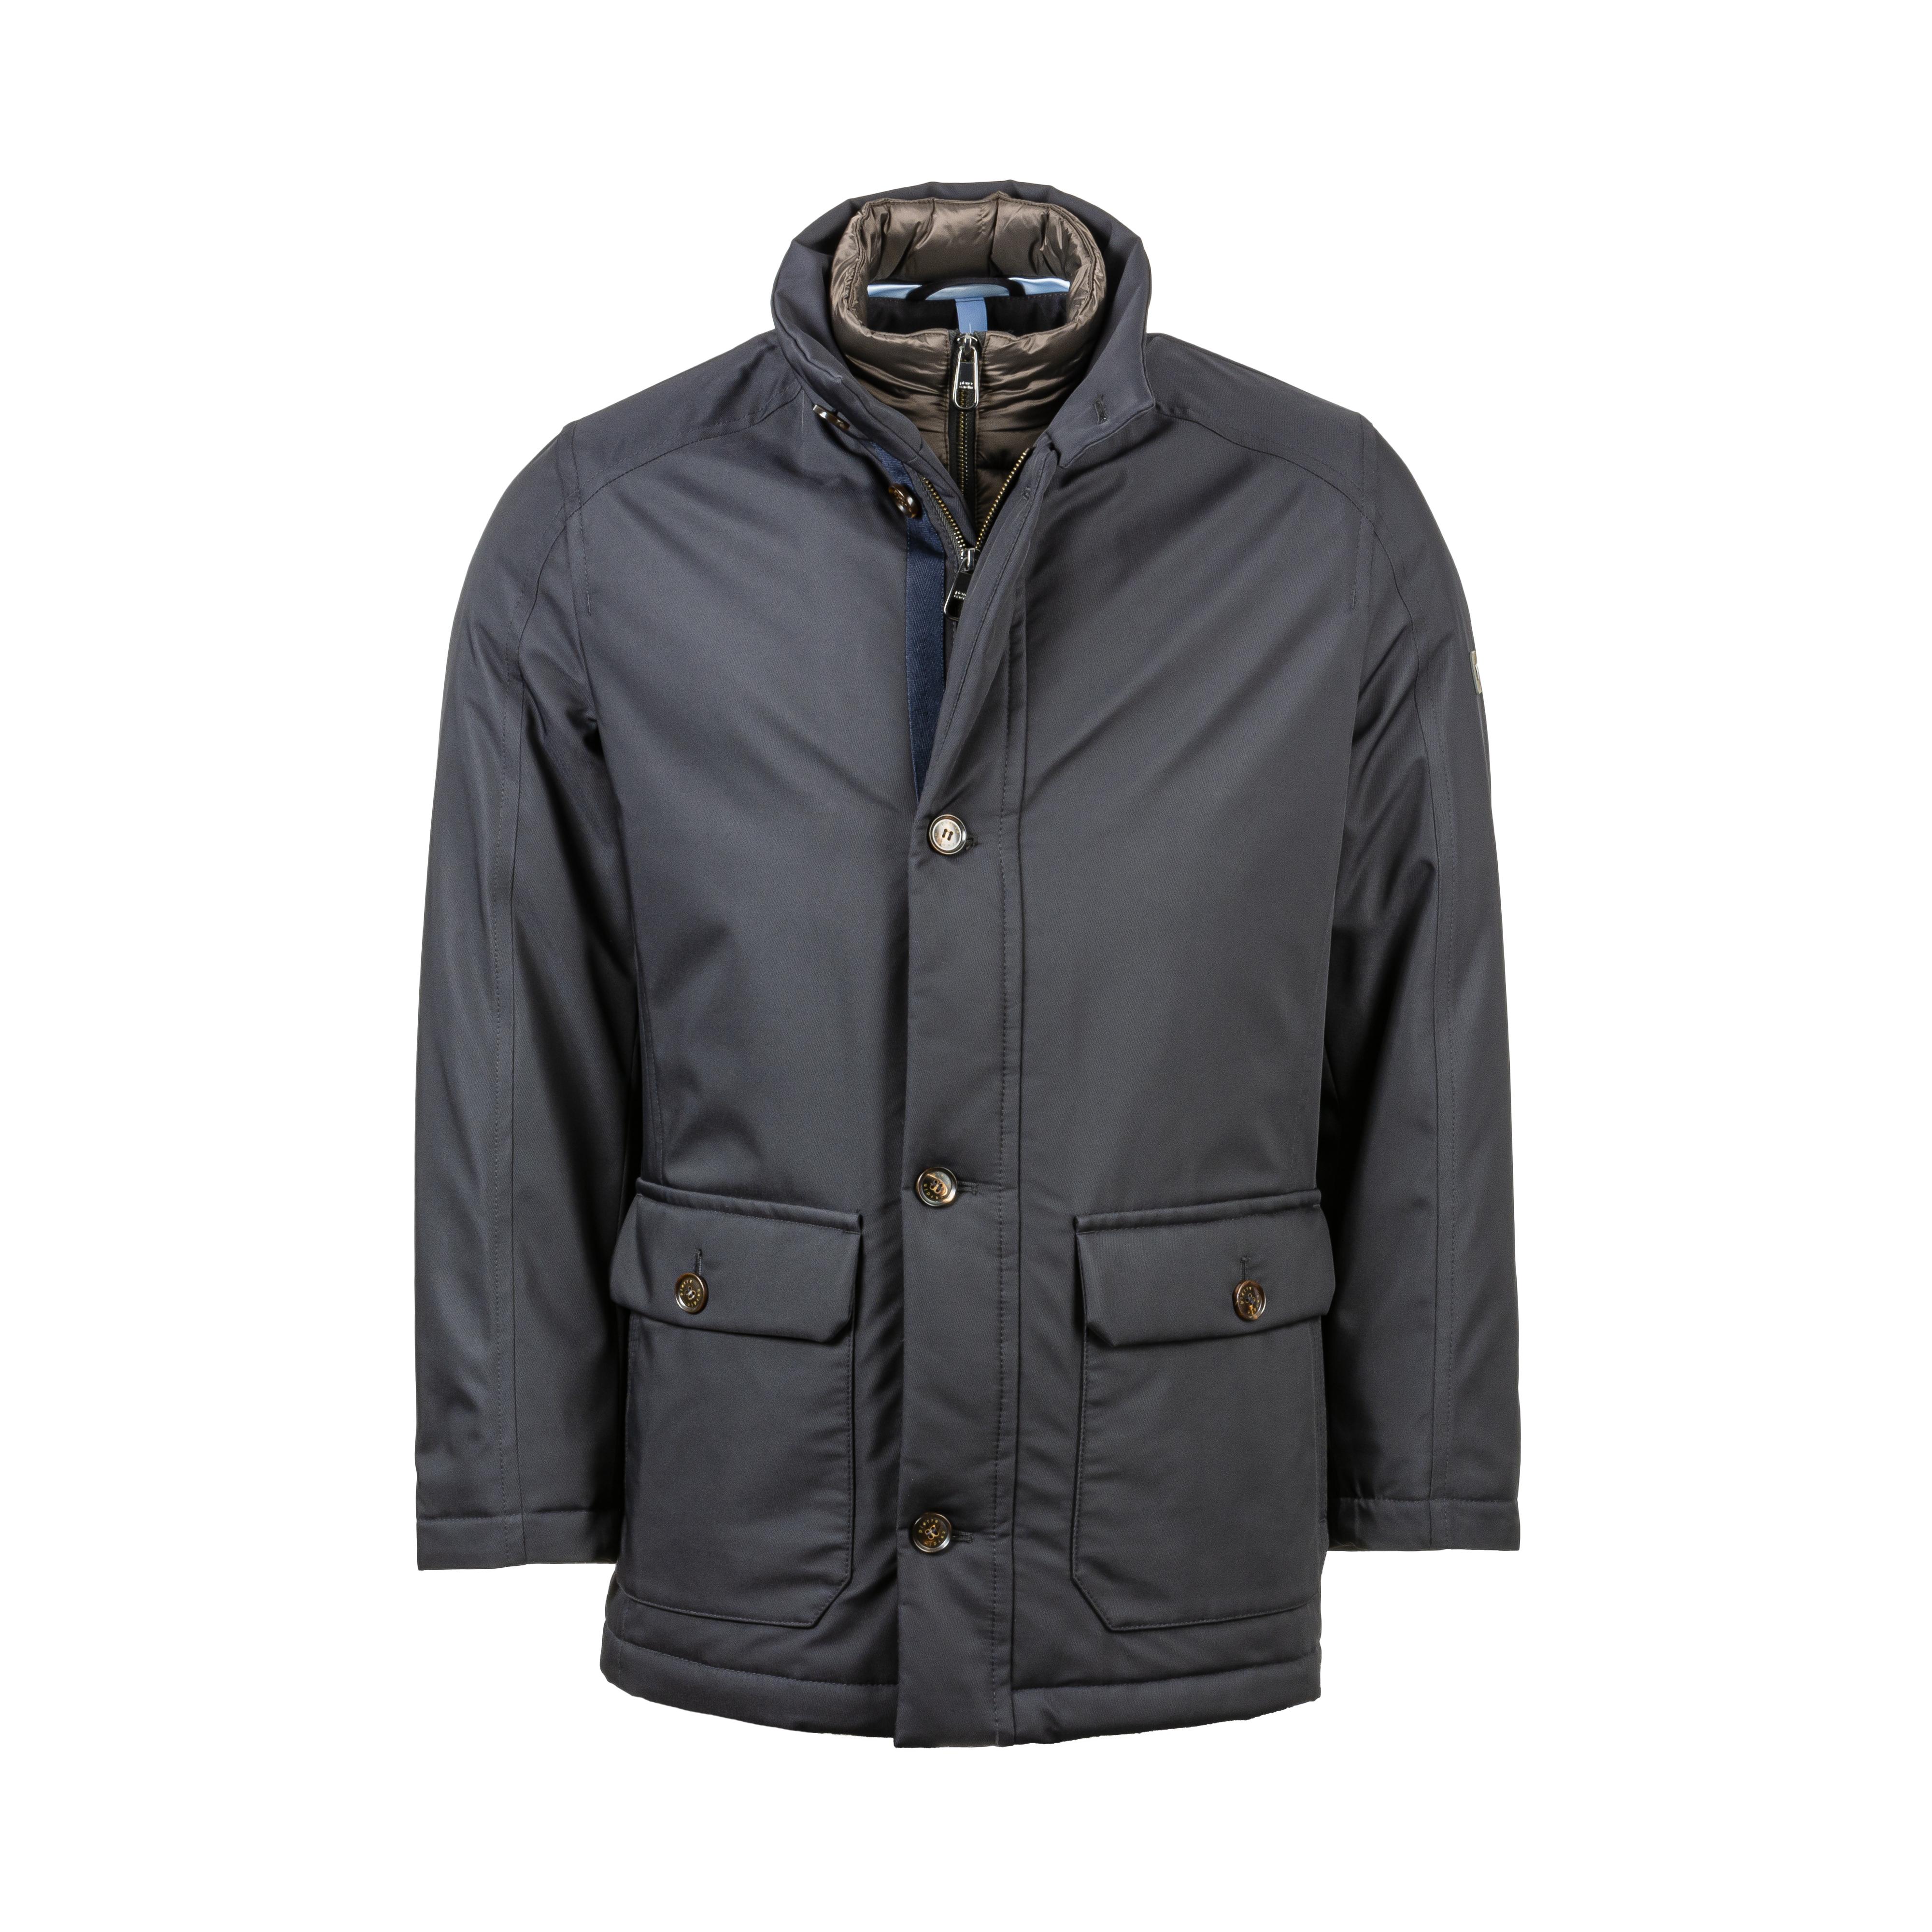 Manteau  bleu marine à doublure effet doudoune